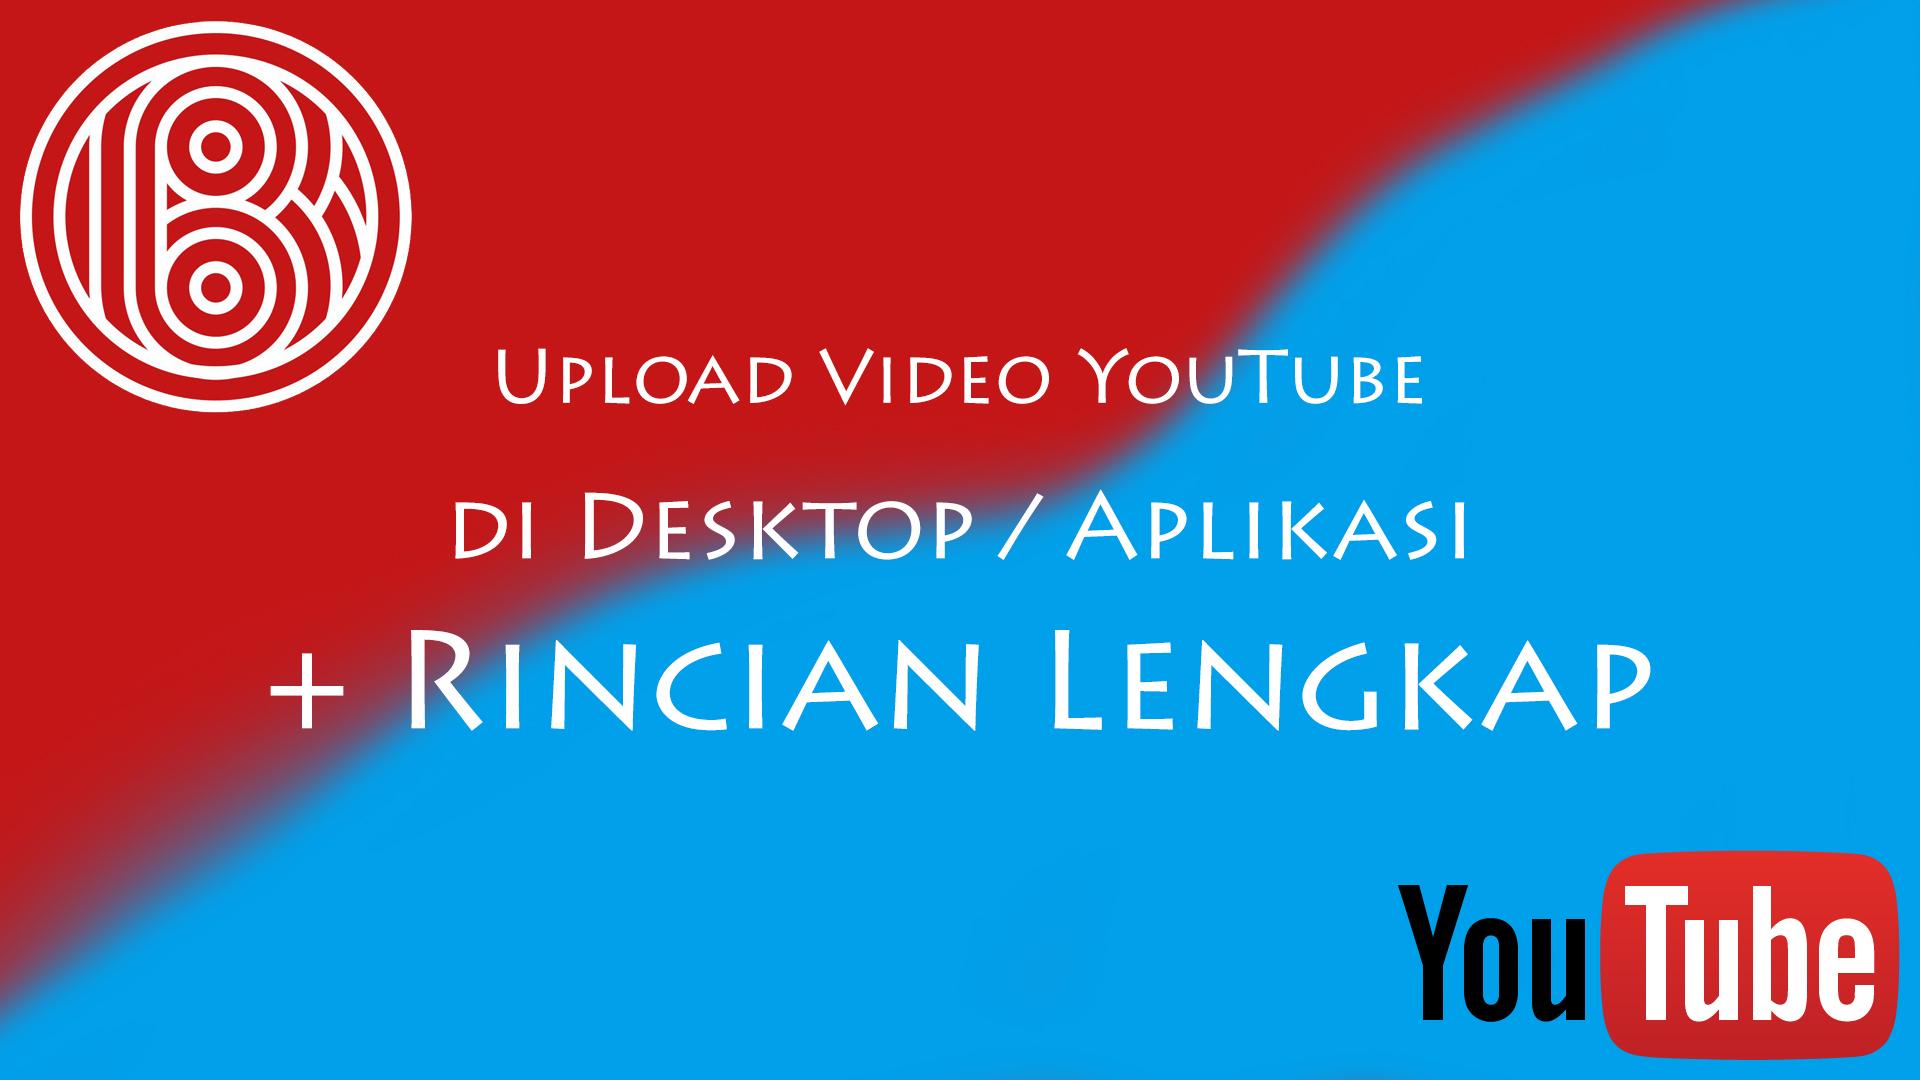 upload video youtube - rio bermano